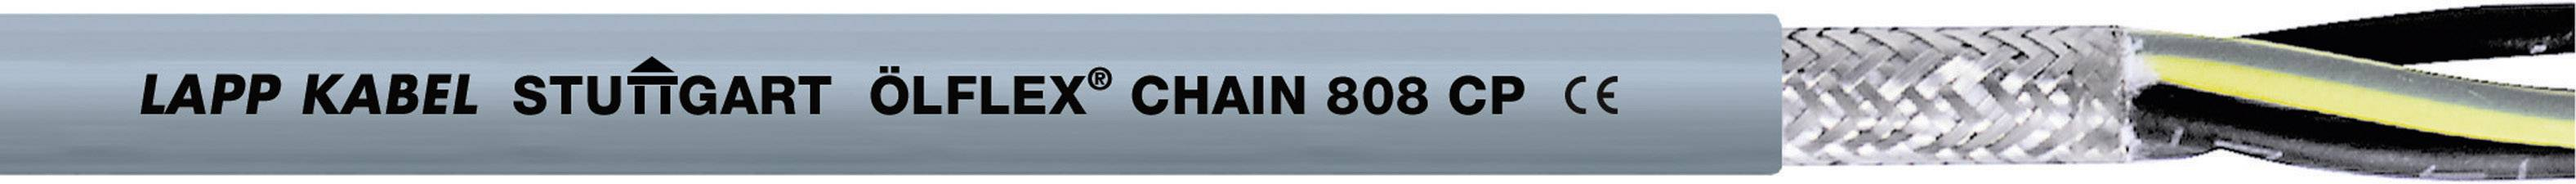 Žíla kabelu LappKabel ÖLFLEX CHAIN 808 CP 12G0,5 (1027756), 12x 0,5 mm², polyurethan, Ø 10 mm, stíněný, 50 m,